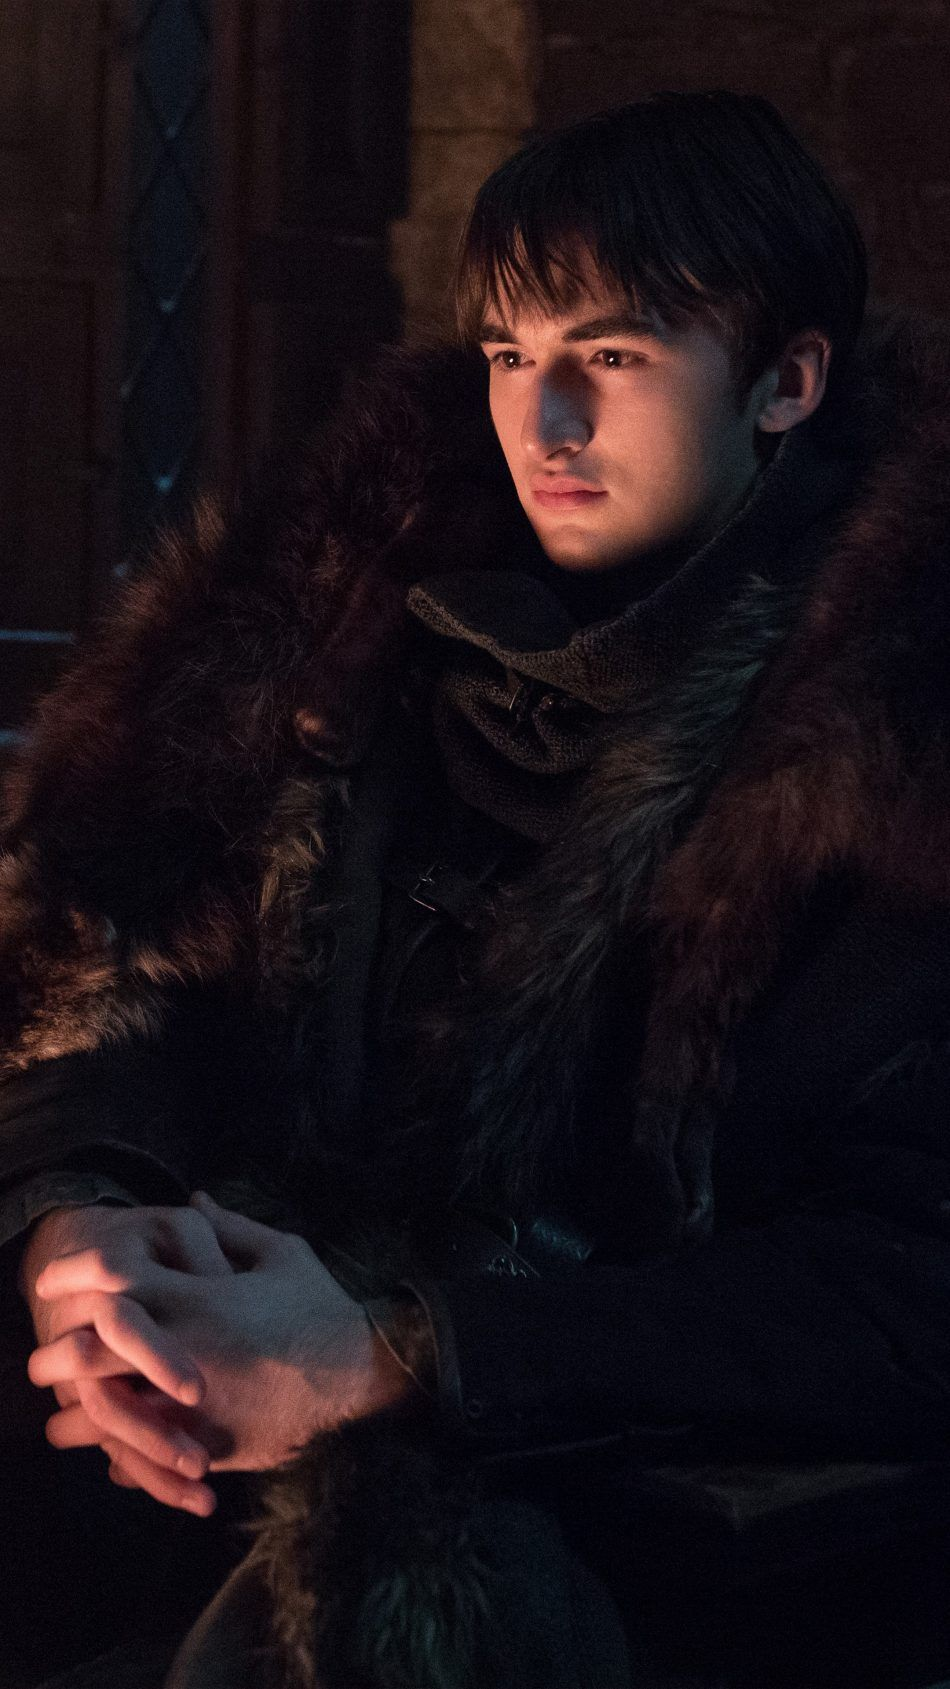 Bran Stark Game Of Thrones 4k Ultra Hd Mobile Wallpaper Best Movie Posters Bran Stark Isaac Hempstead Wright